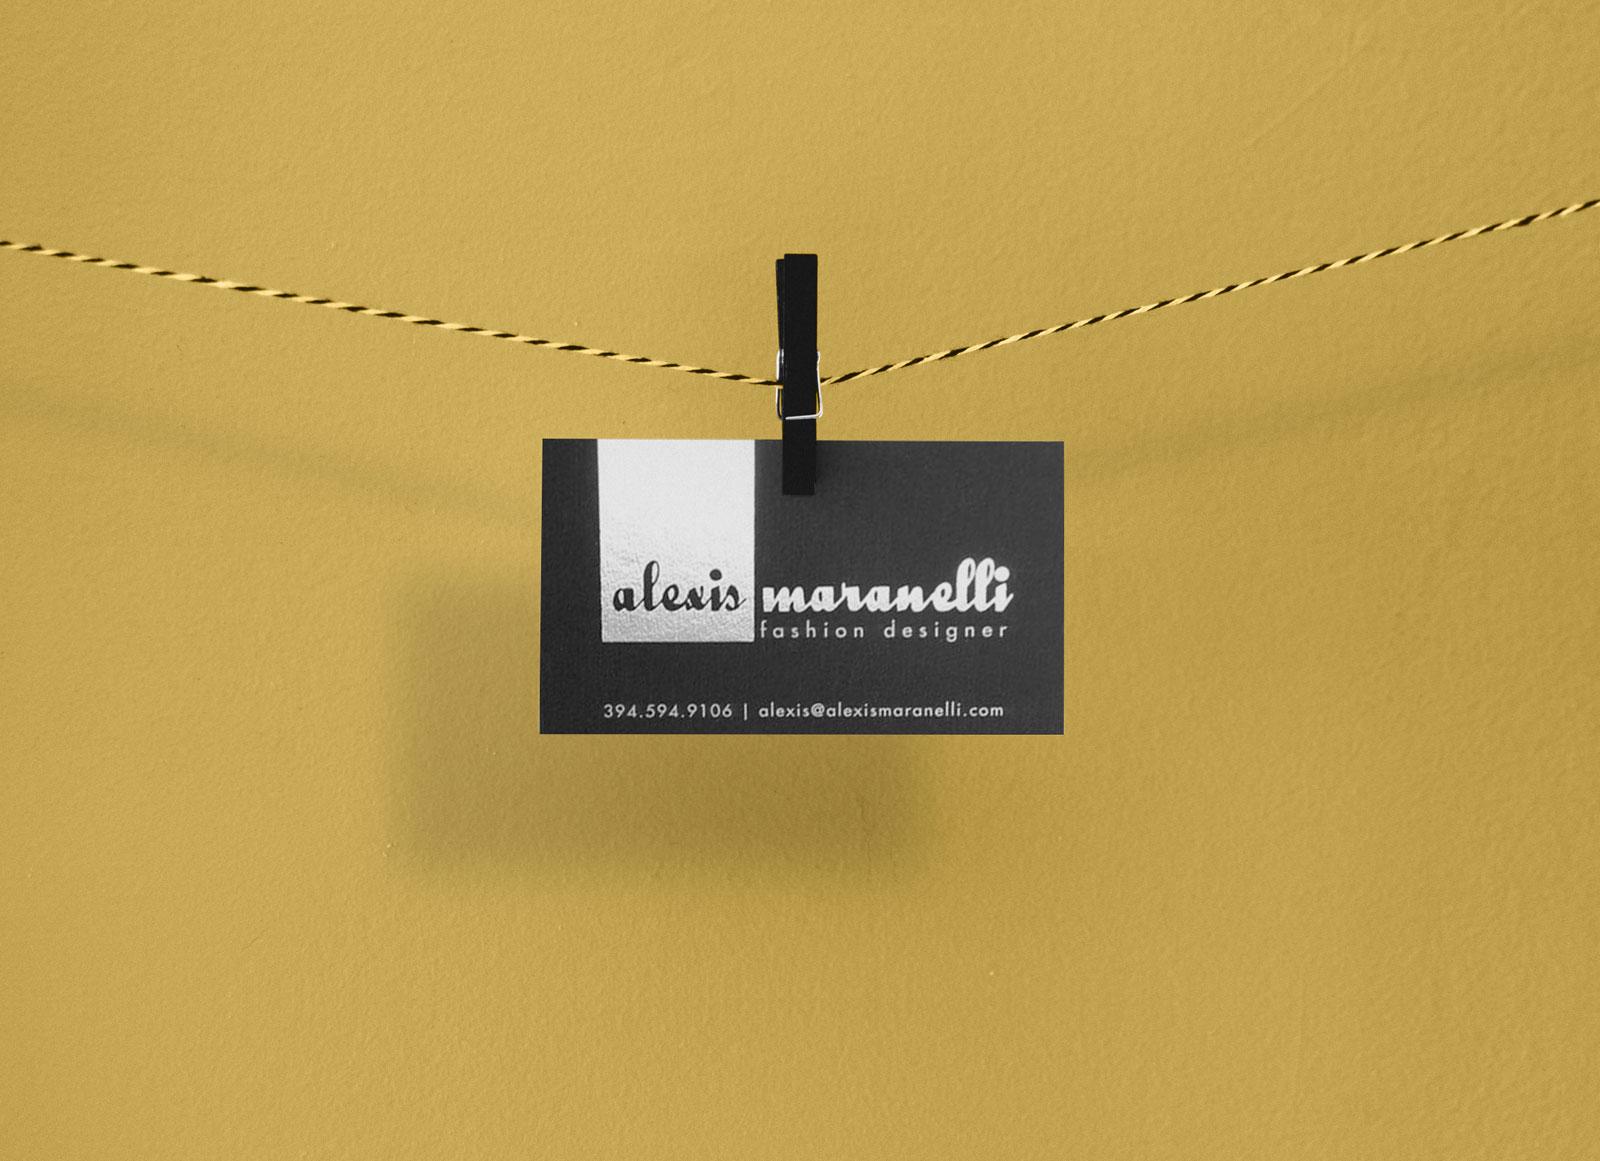 Free-Photorealistic-Business-Card-Mockup-PSD